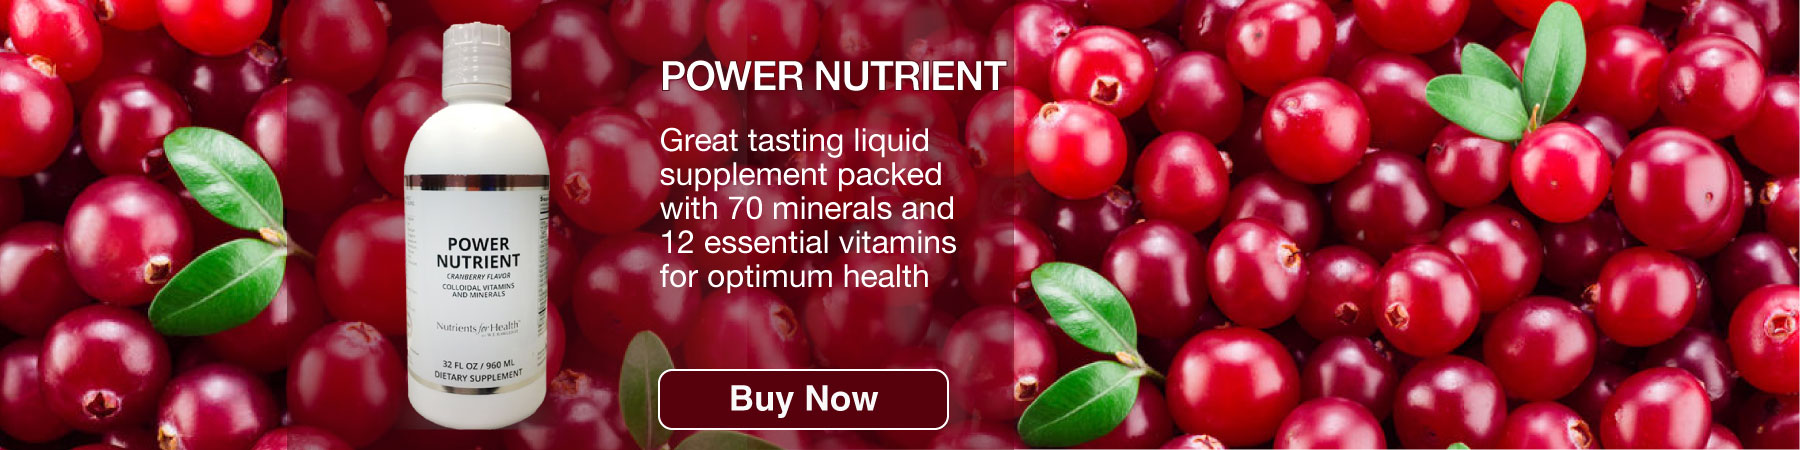 power nutrient